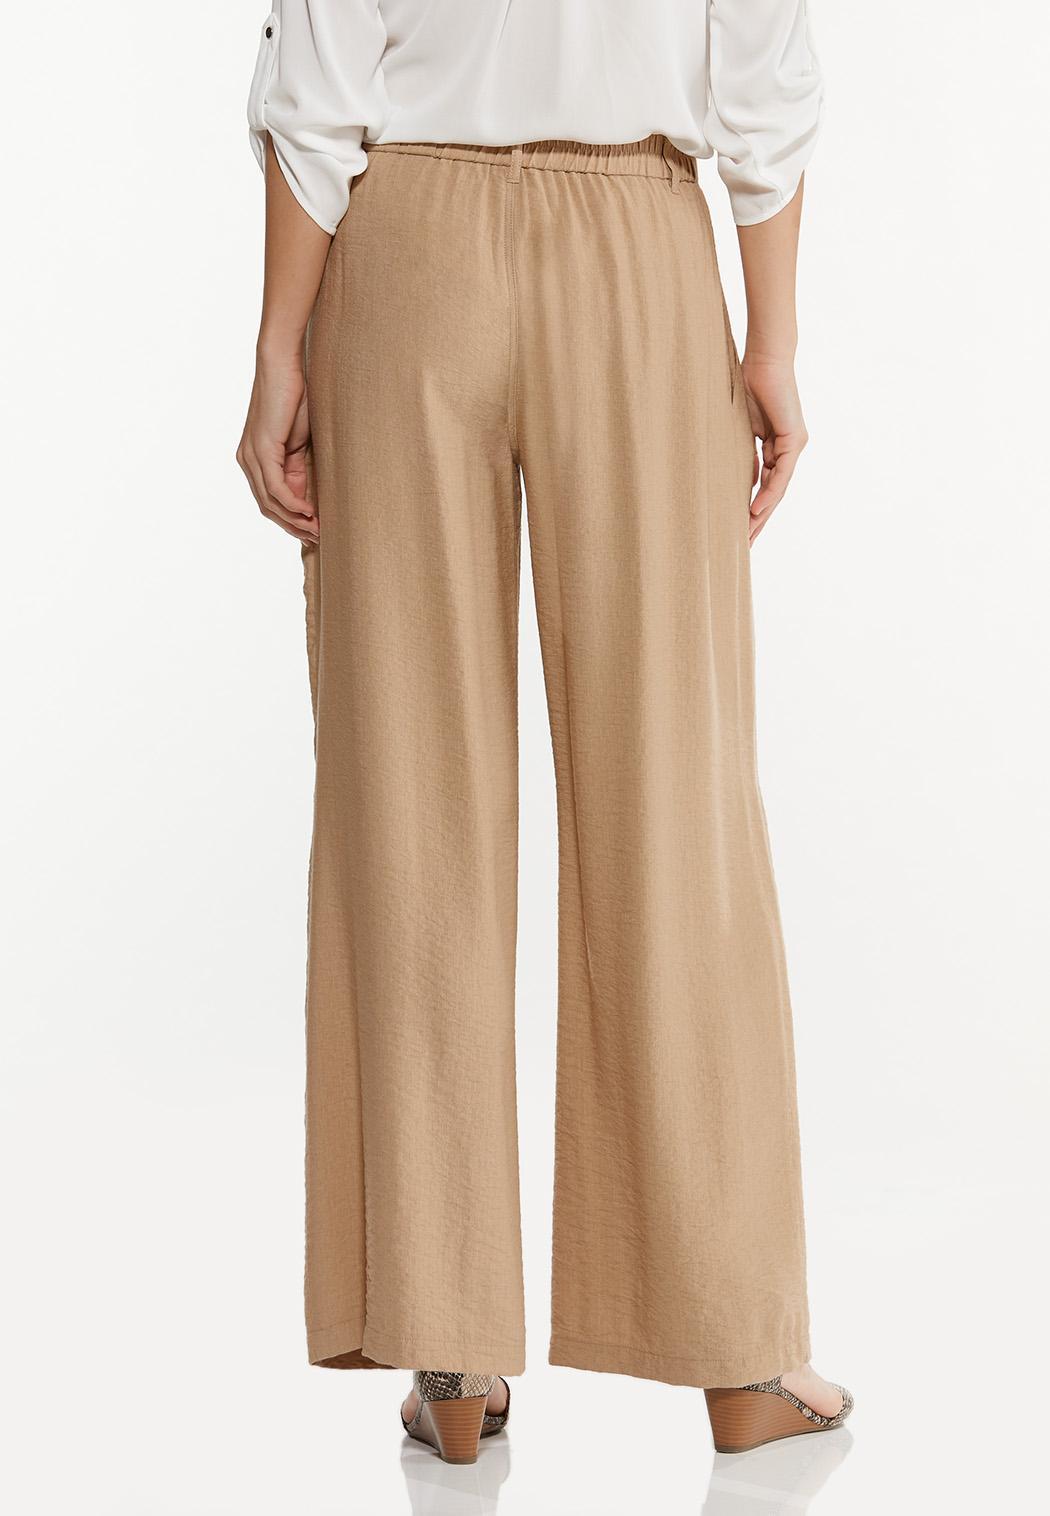 Tan Wide Leg Pants (Item #44515446)